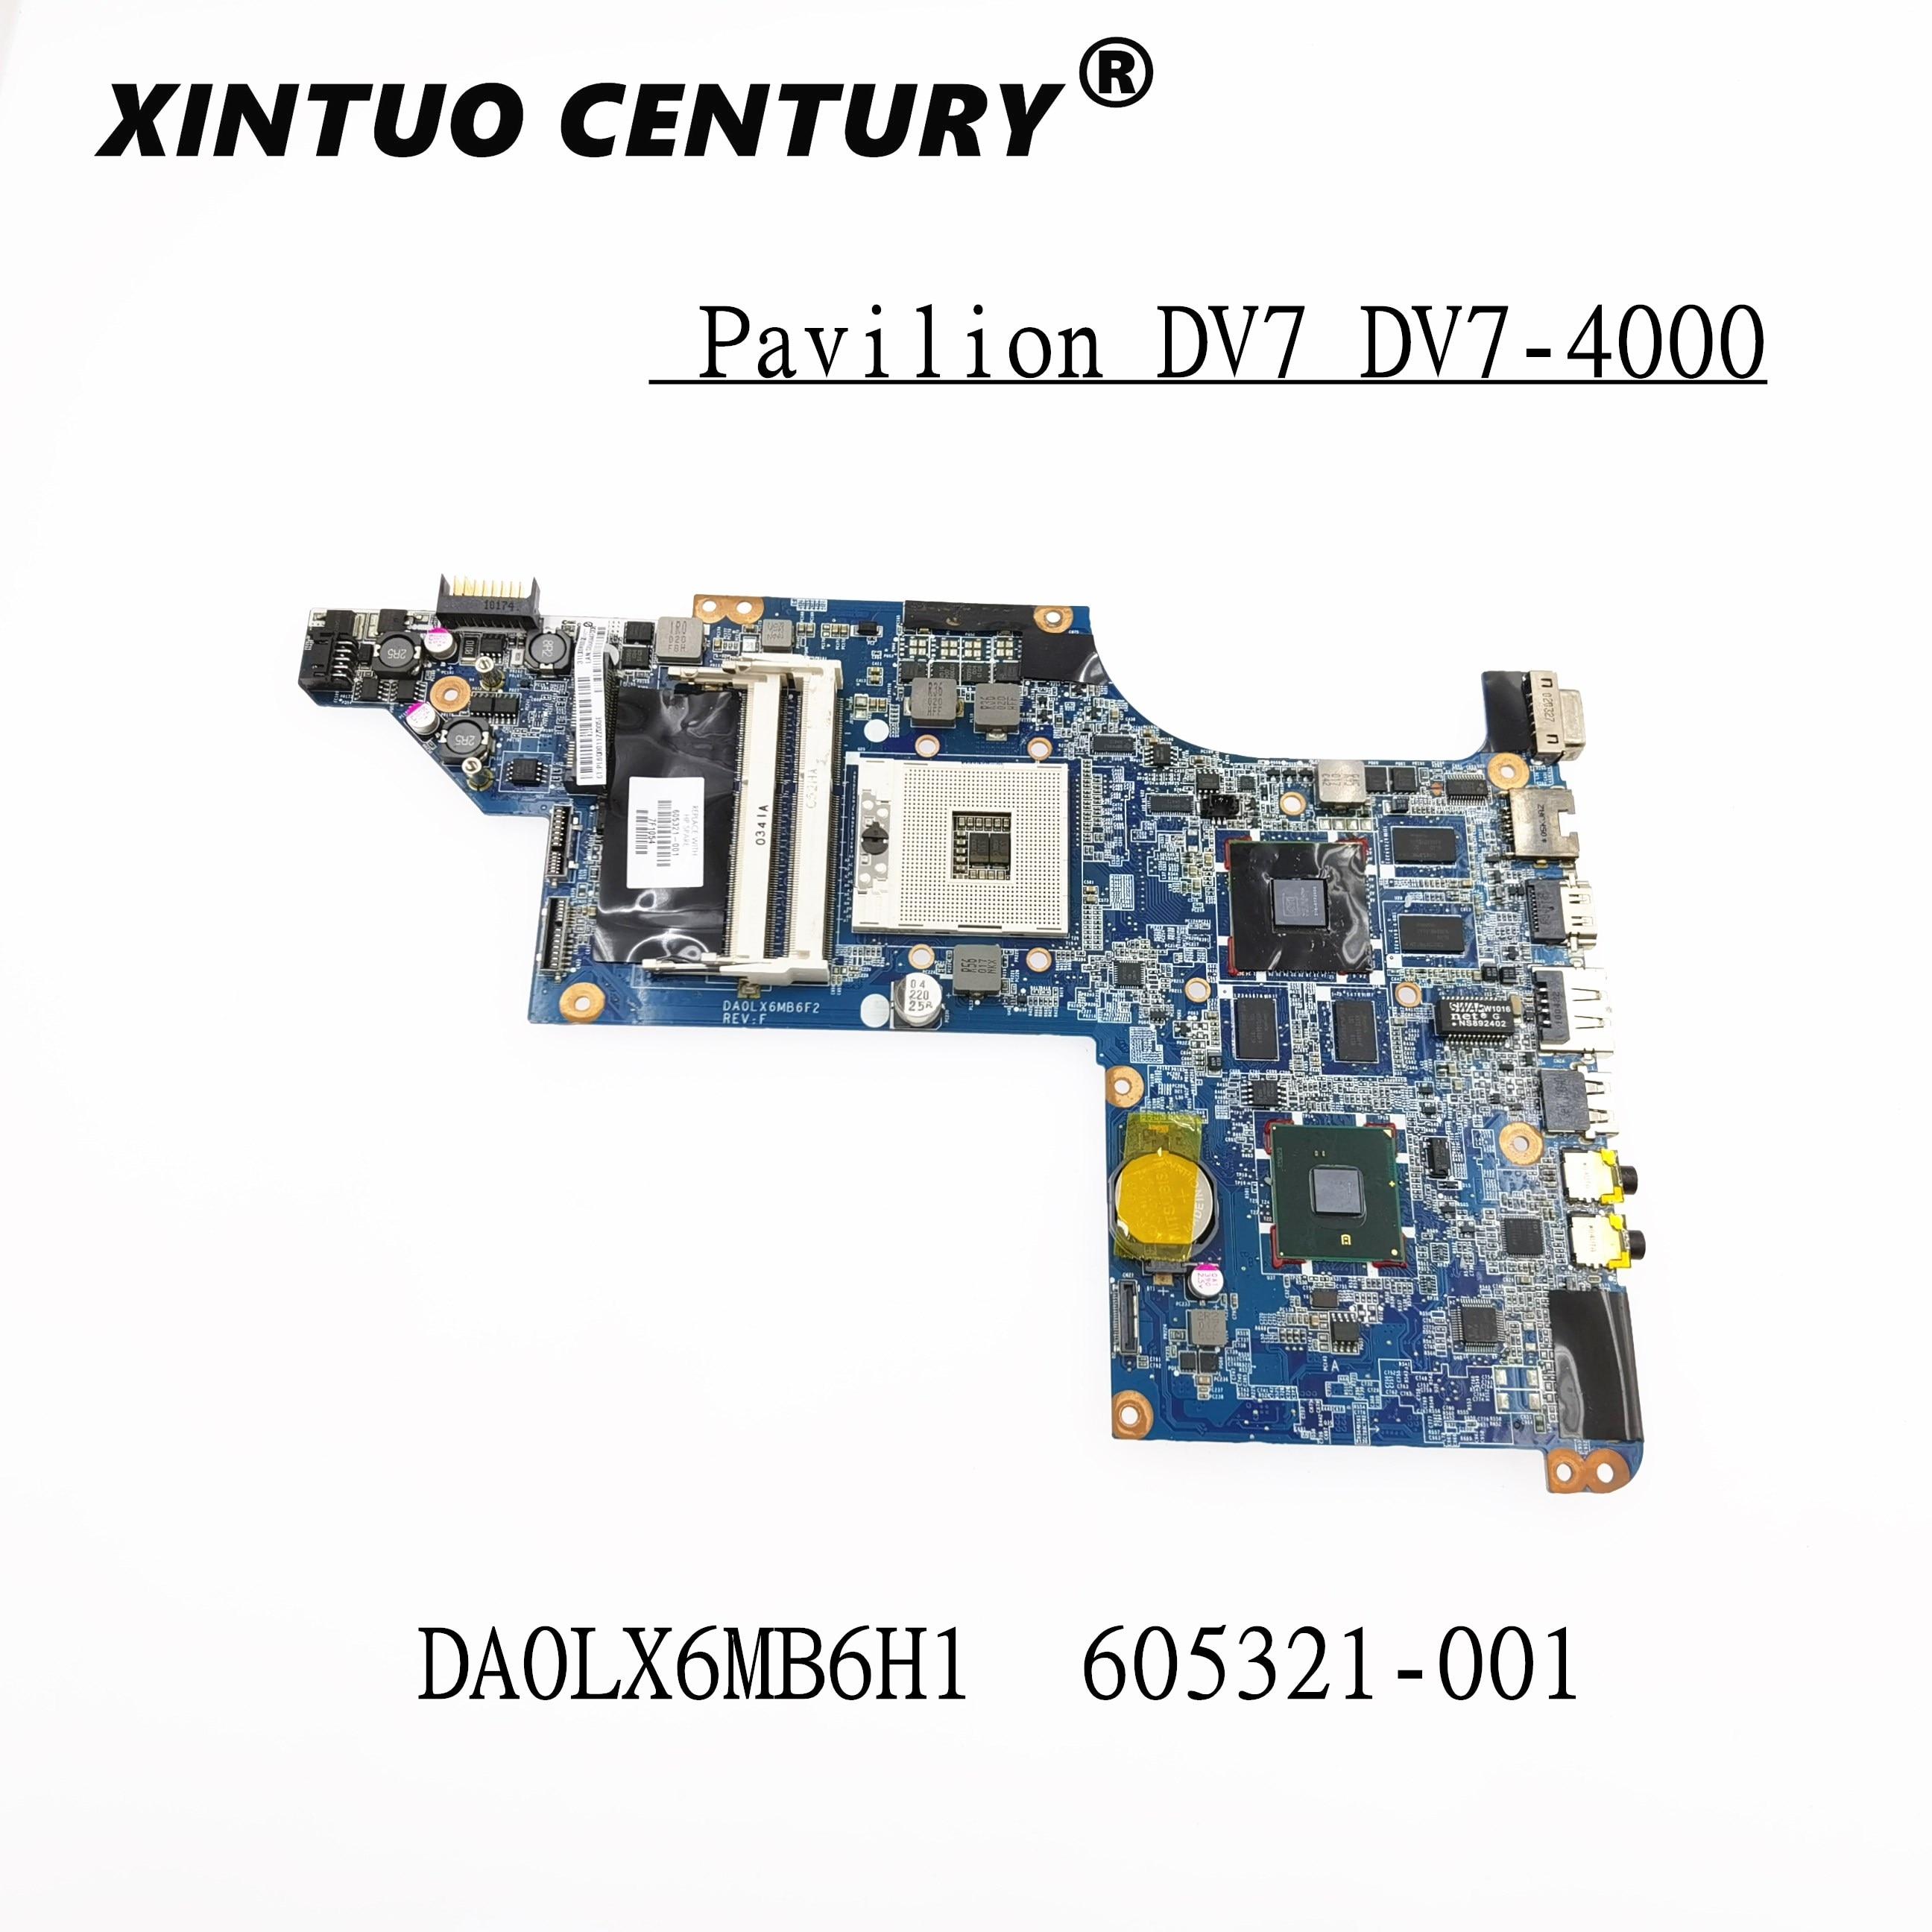 Original 605321-001 placa base para HP dv7-4000 DV7T mainrboard DA0LX6MB6G2 DA0LX6MB6F1 DA0LX6MB6H1...